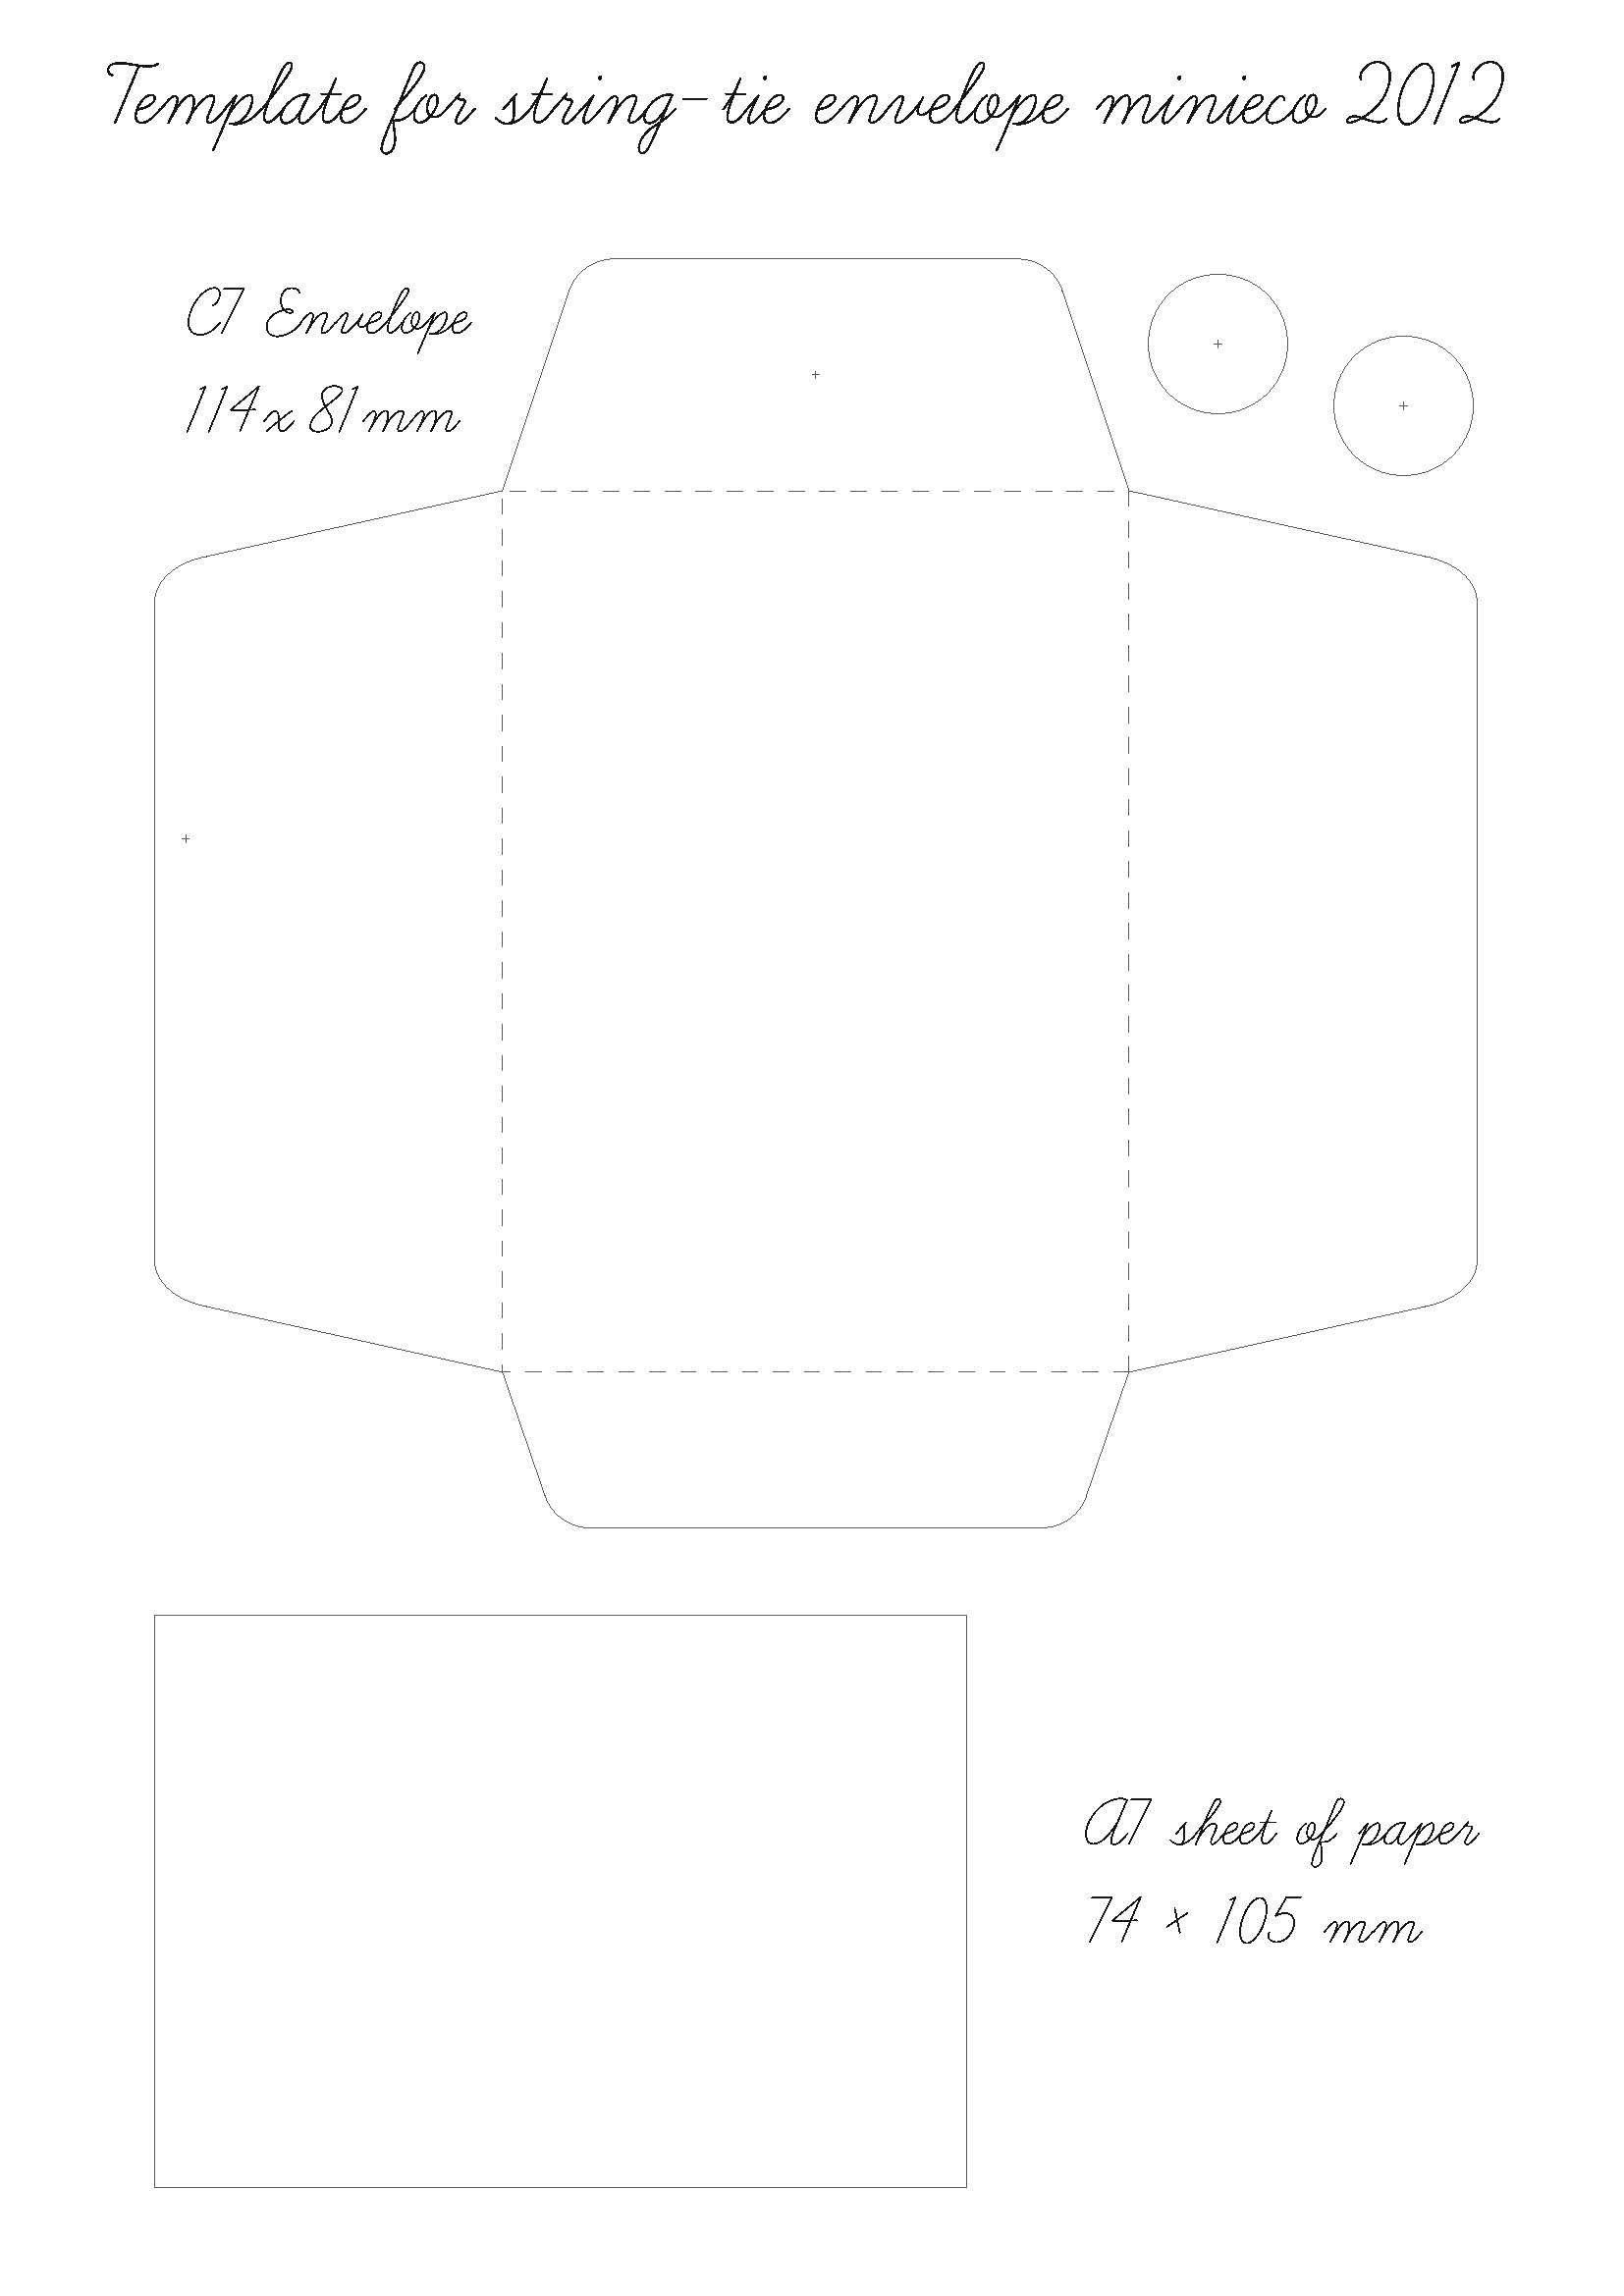 Amp Pinterest In Action In 2020 Envelope Template Envelope